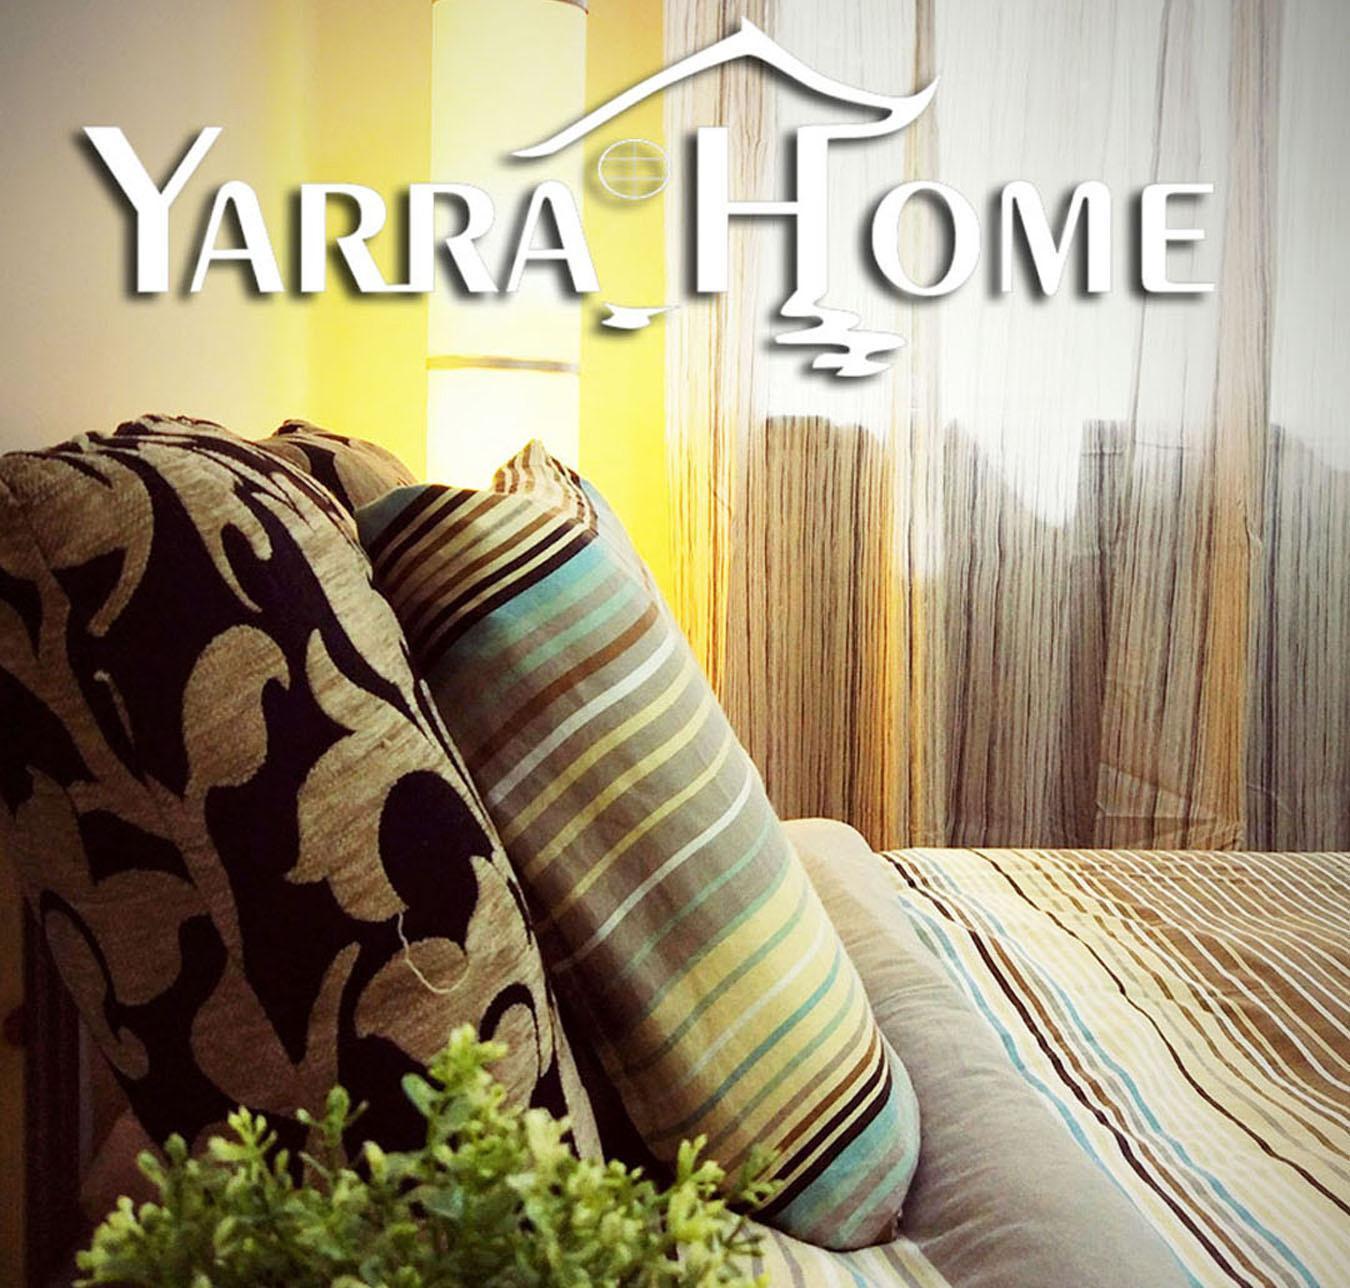 Quiet,Cozy, Tidy,Original aussie life-Yarra Home-A